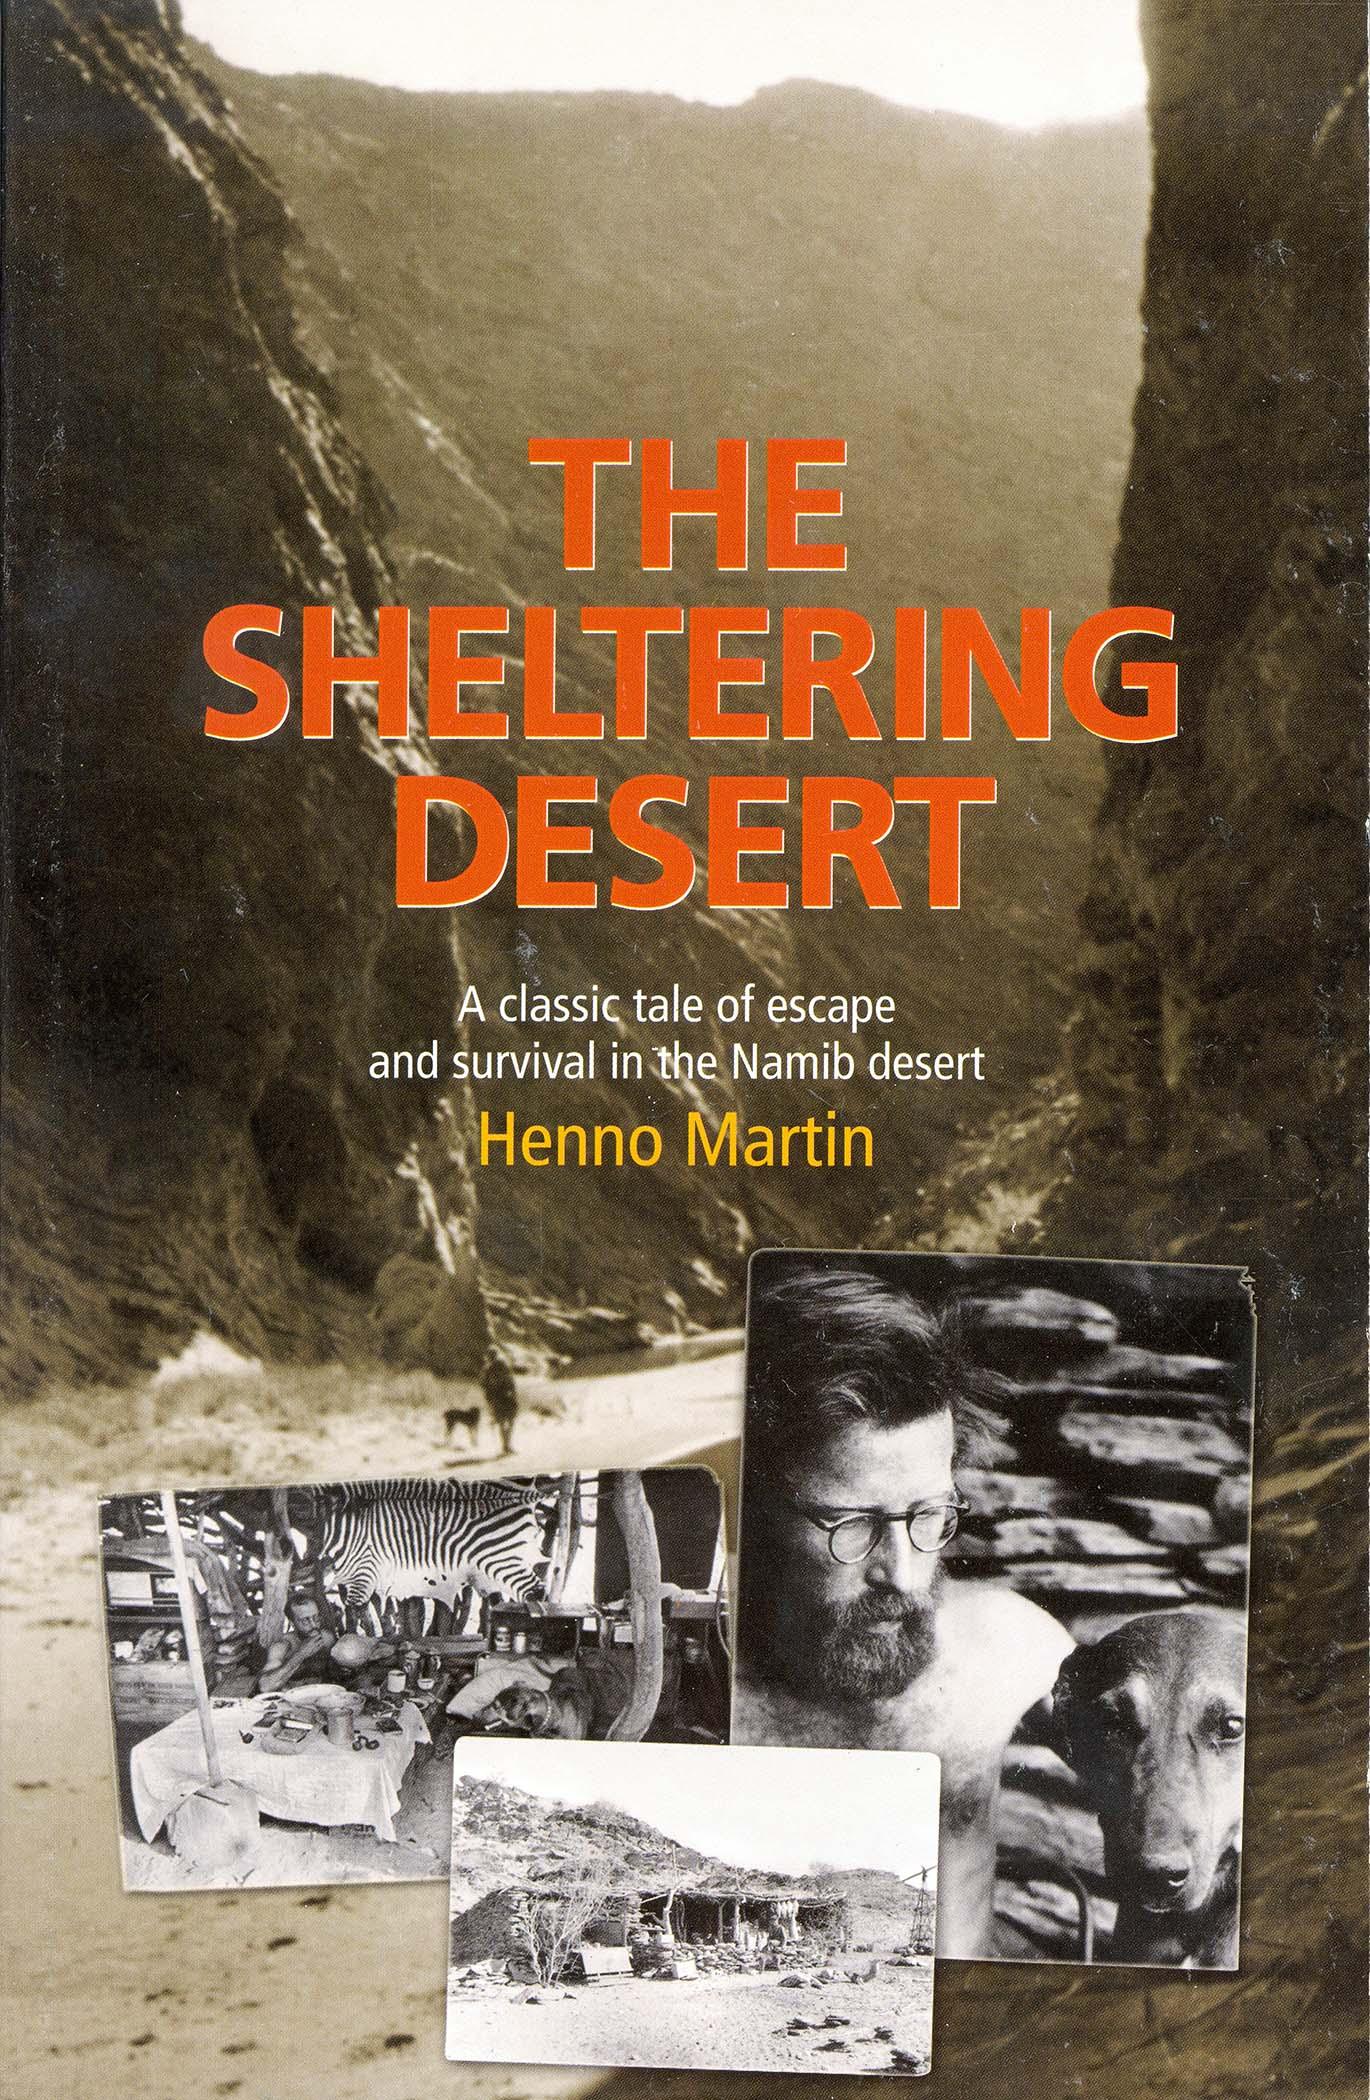 The nurturing Namib Desert